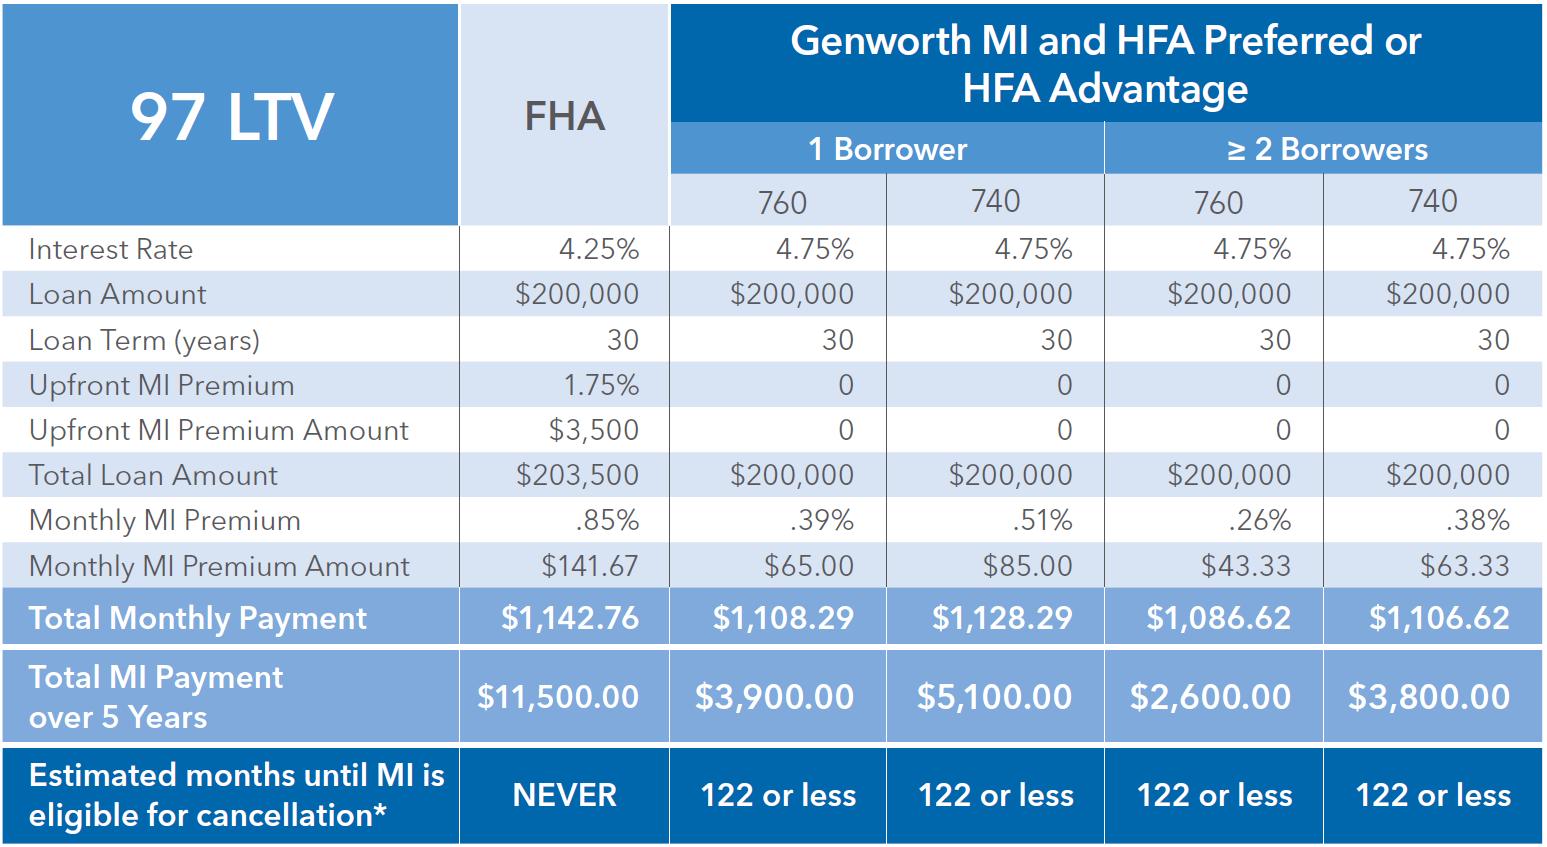 FHA HFA Loans Comparison Table